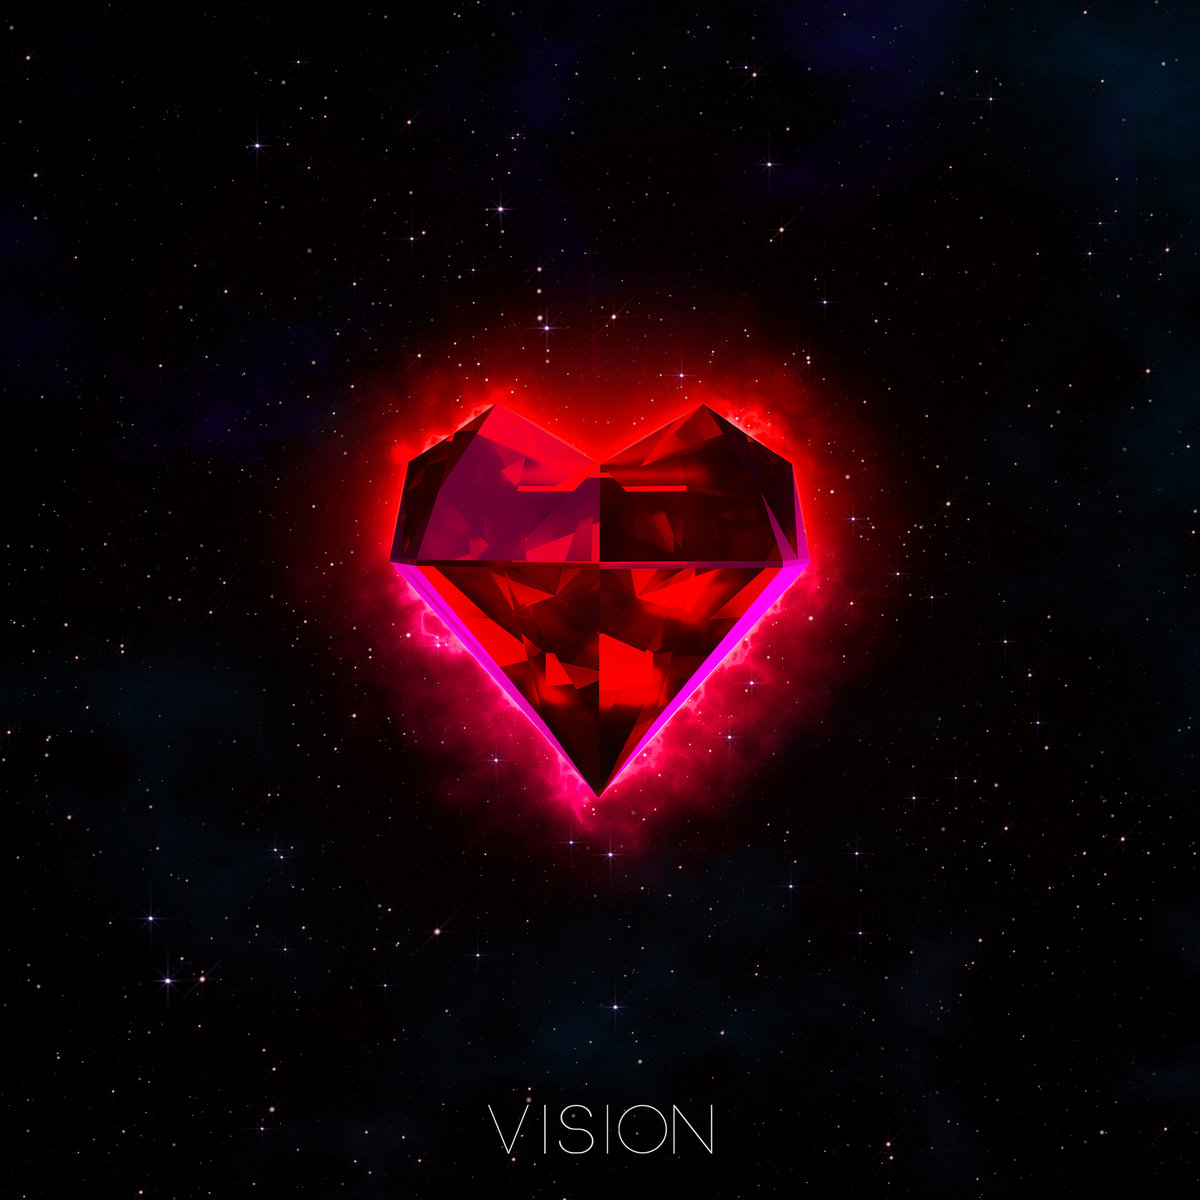 Maximum Love - Vision EP WEB (2017) [FLAC] Download